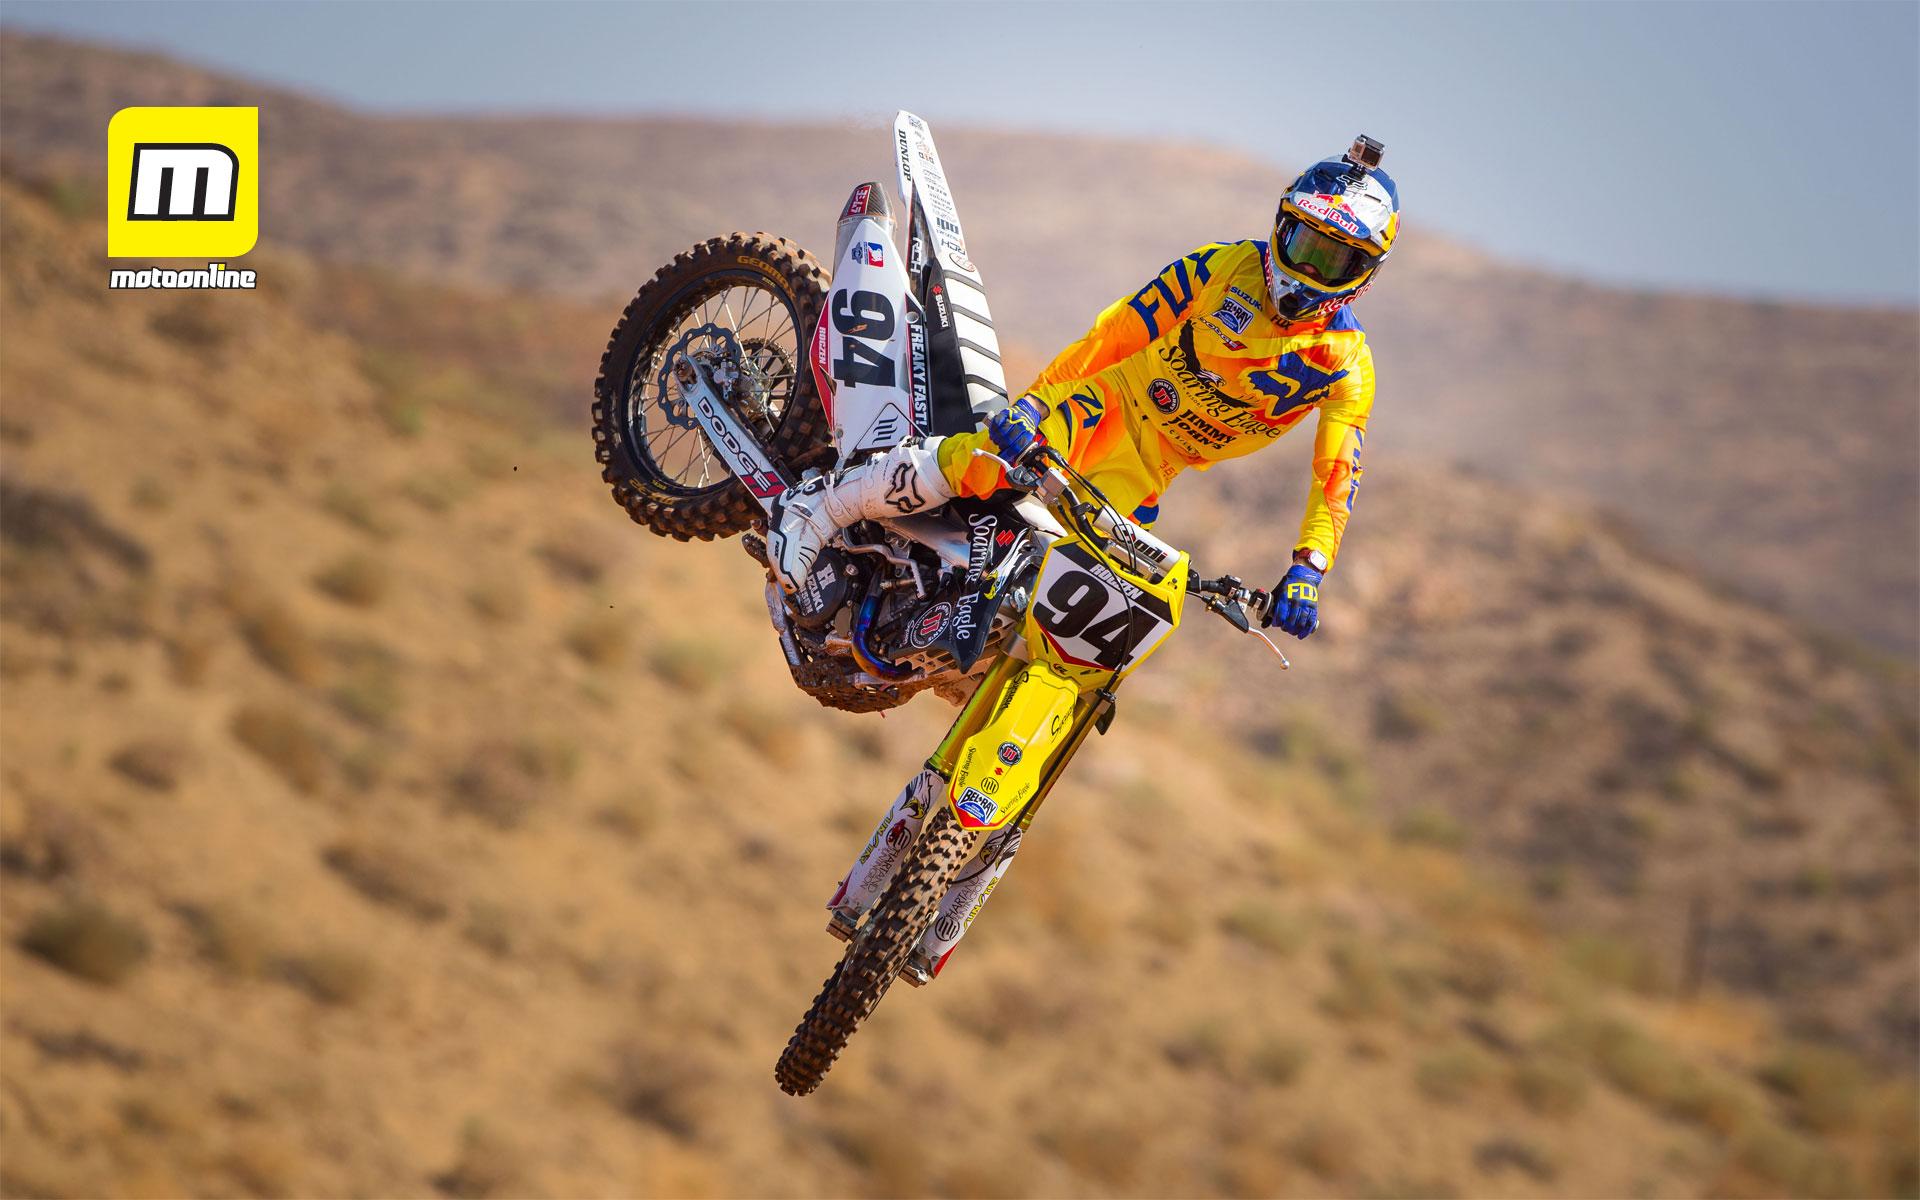 Motorcycle Racing On The Sand Suzuki Hd Desktop Mobile